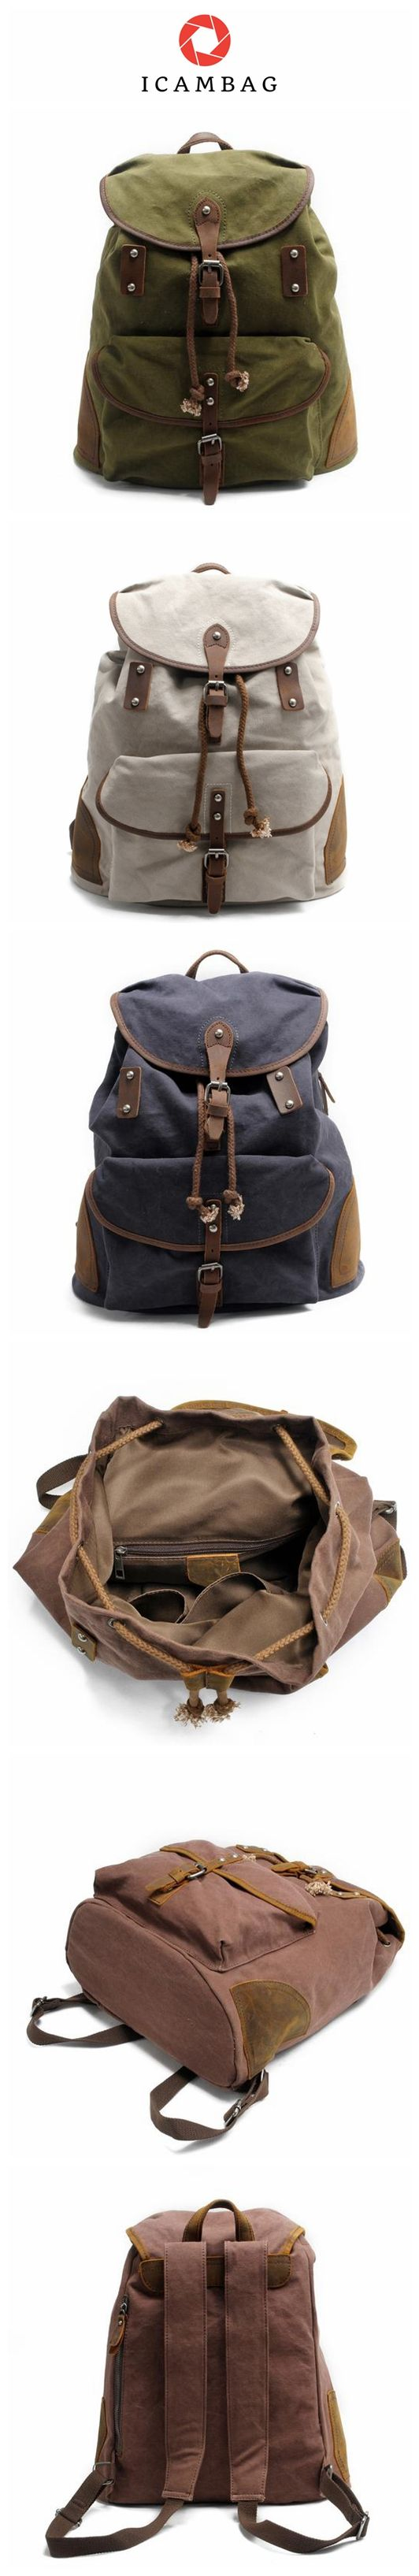 England Leisure Leather Canvas Backpack Shool Bag 82043K